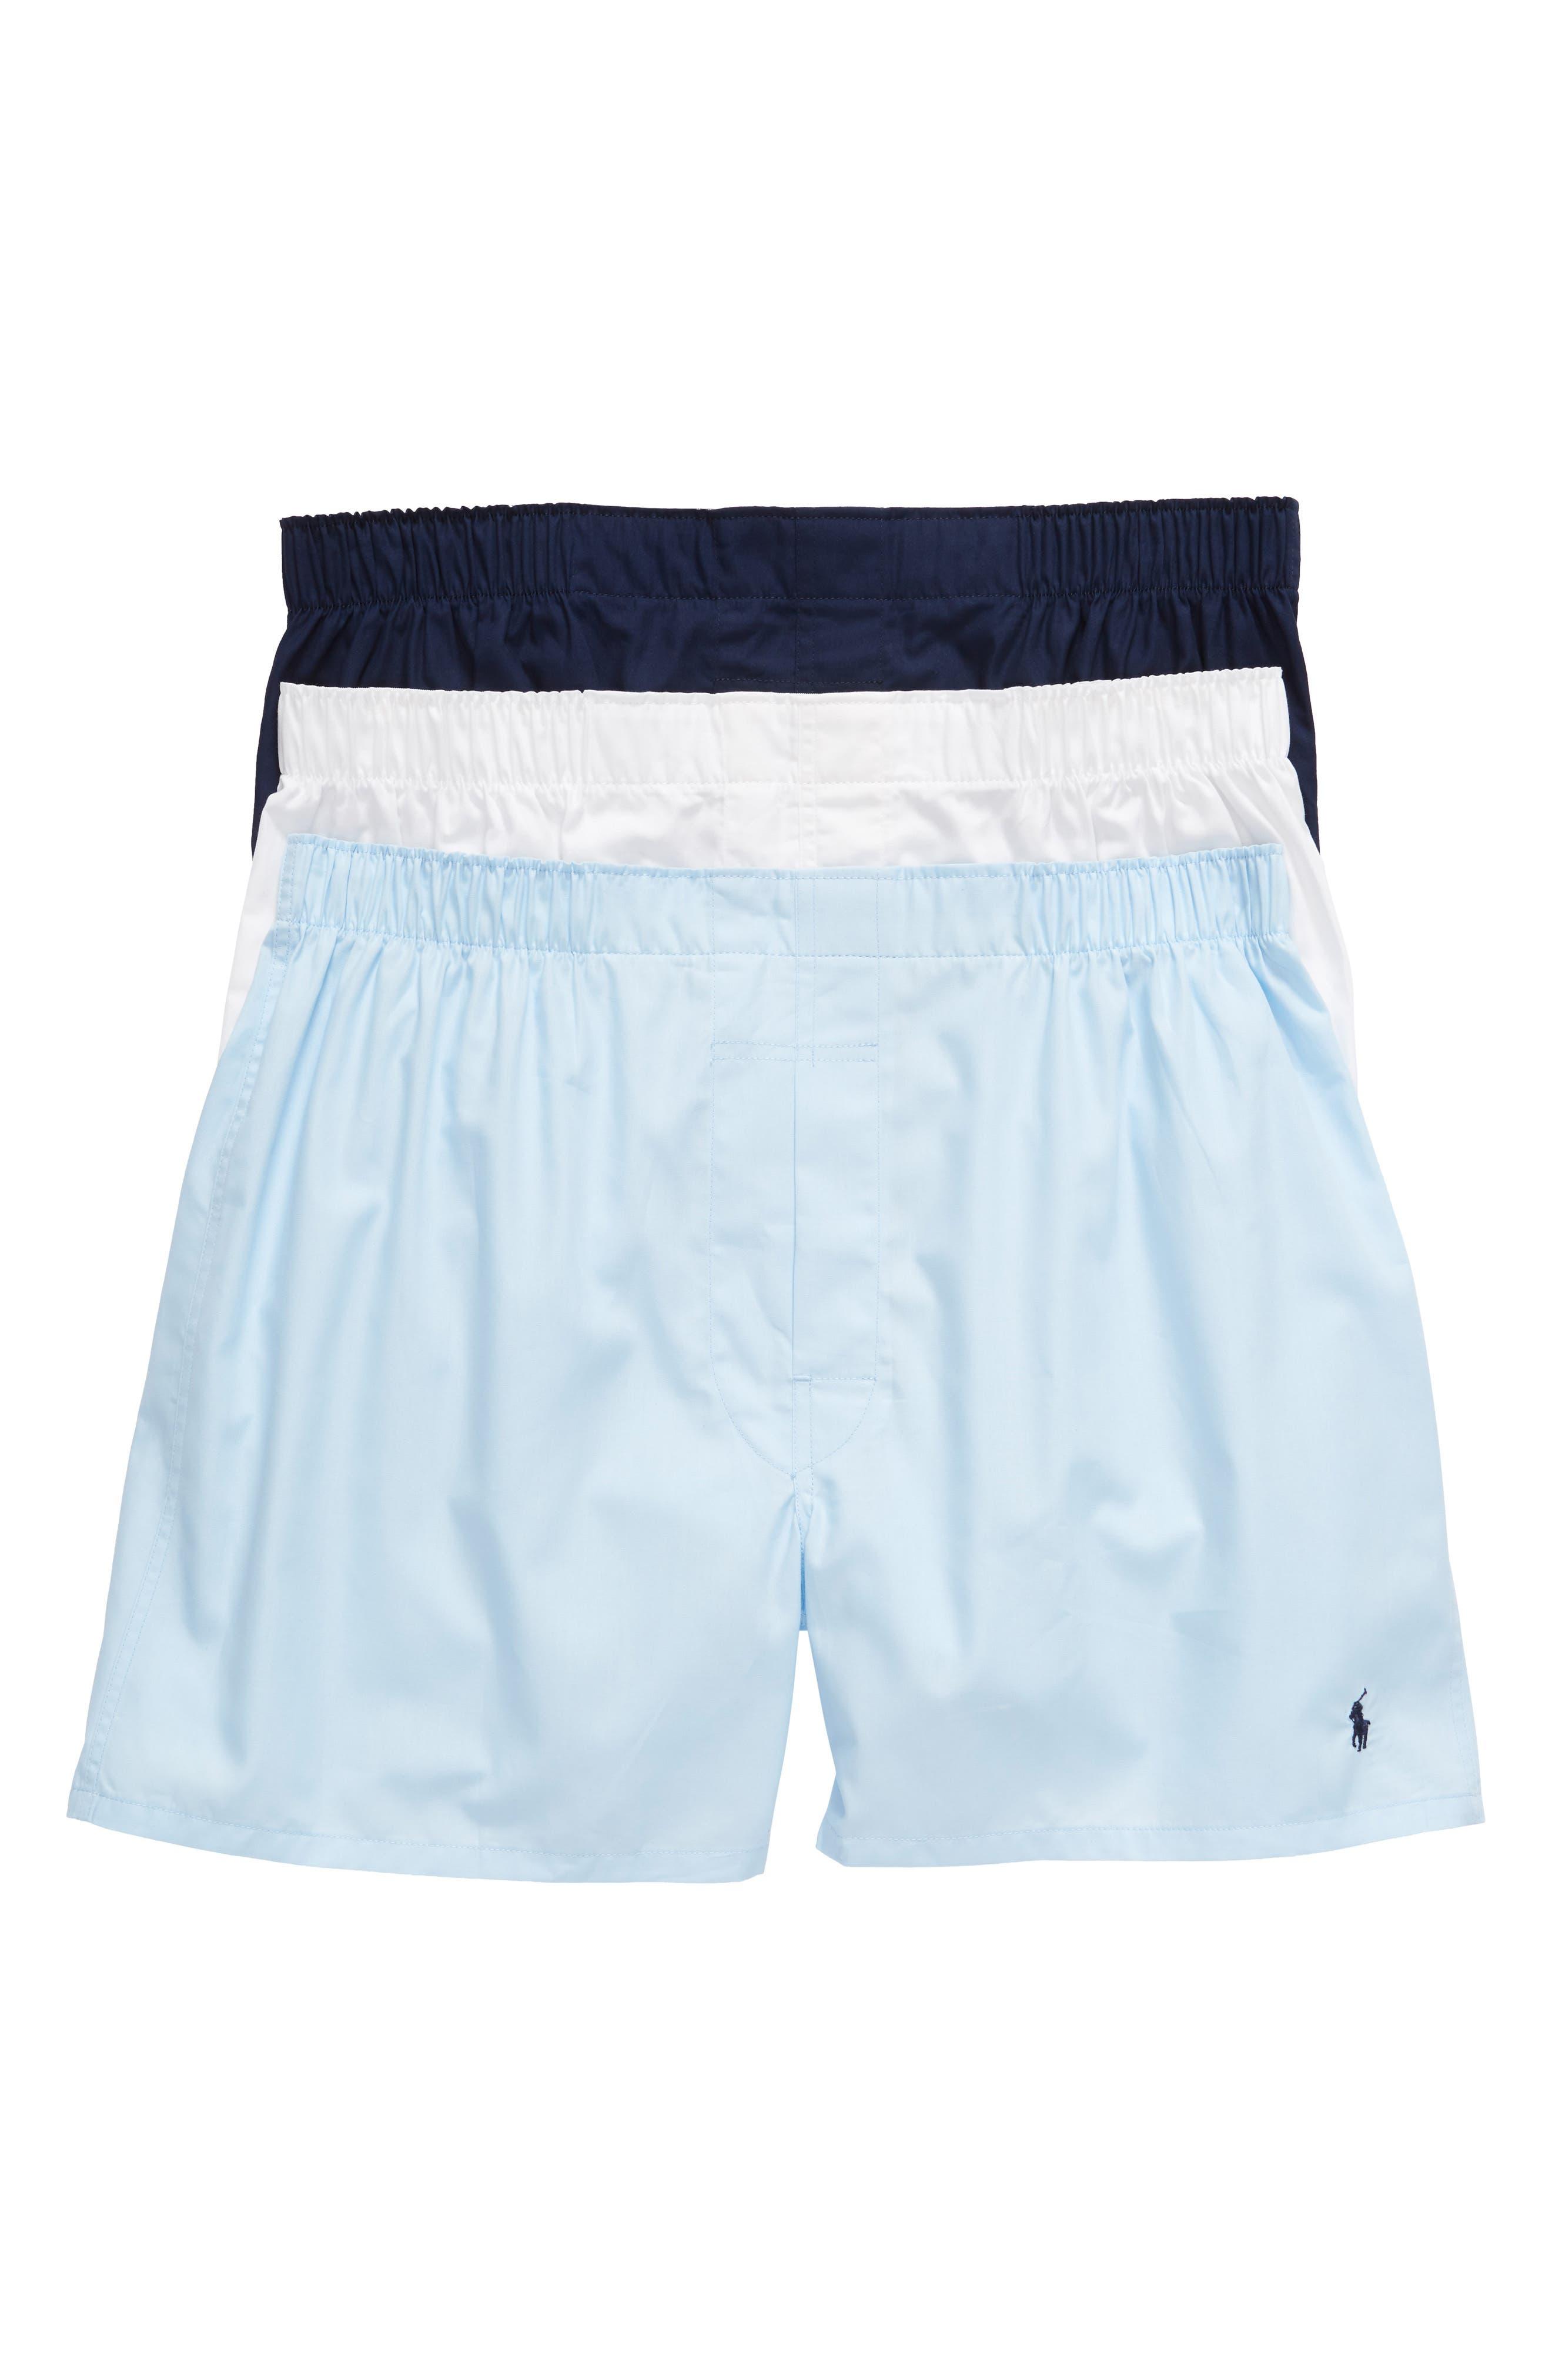 Polo Ralph Lauren 3-Pack Boxers